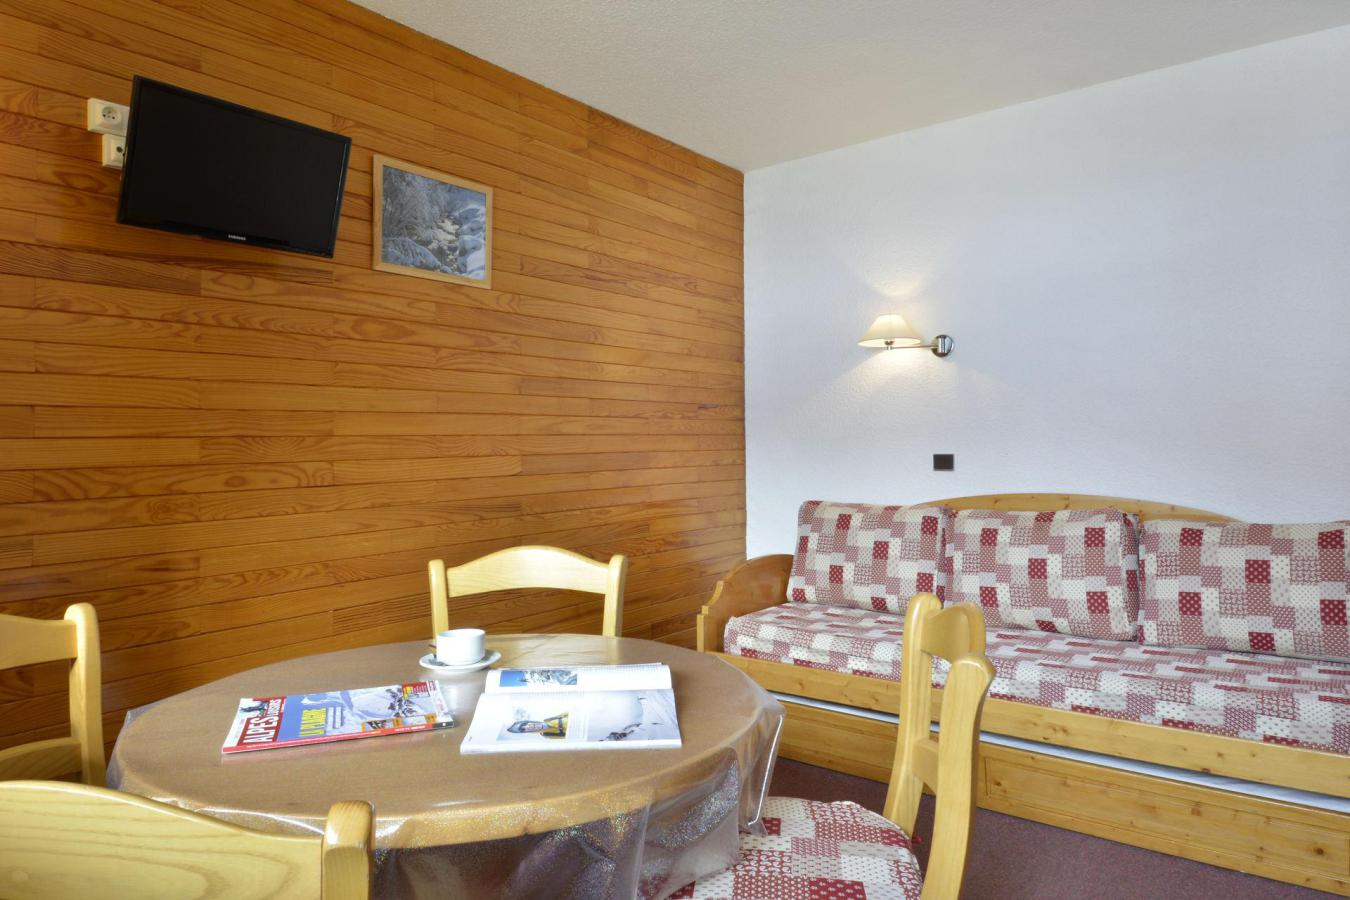 Location au ski Studio 4 personnes (12) - Residence Carroley B - La Plagne